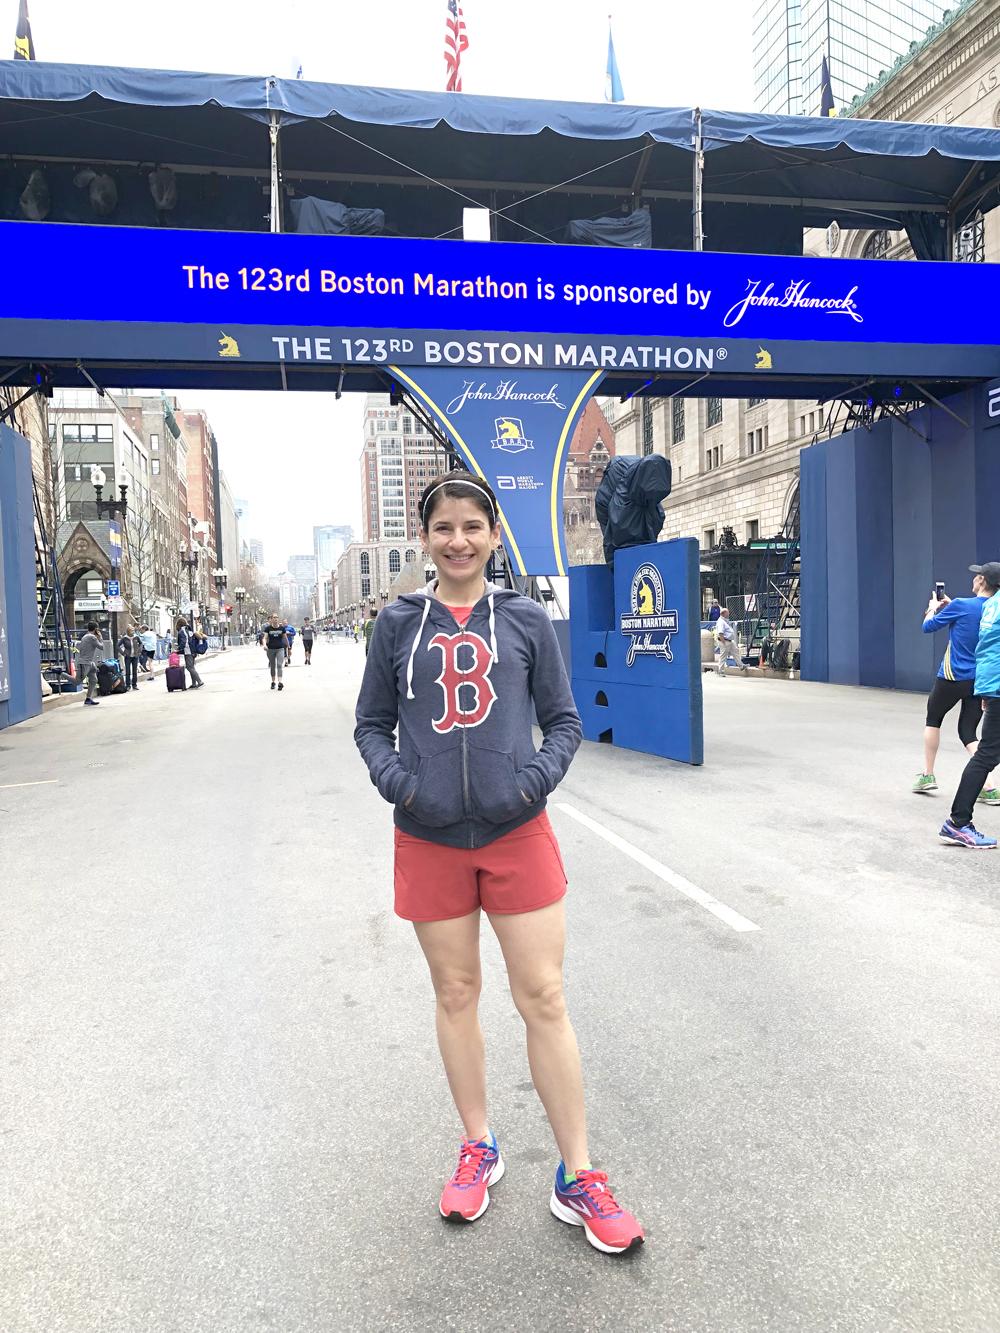 Bonnie Yesian PT Boston Marathon 2 April 2019 Dothan Revised